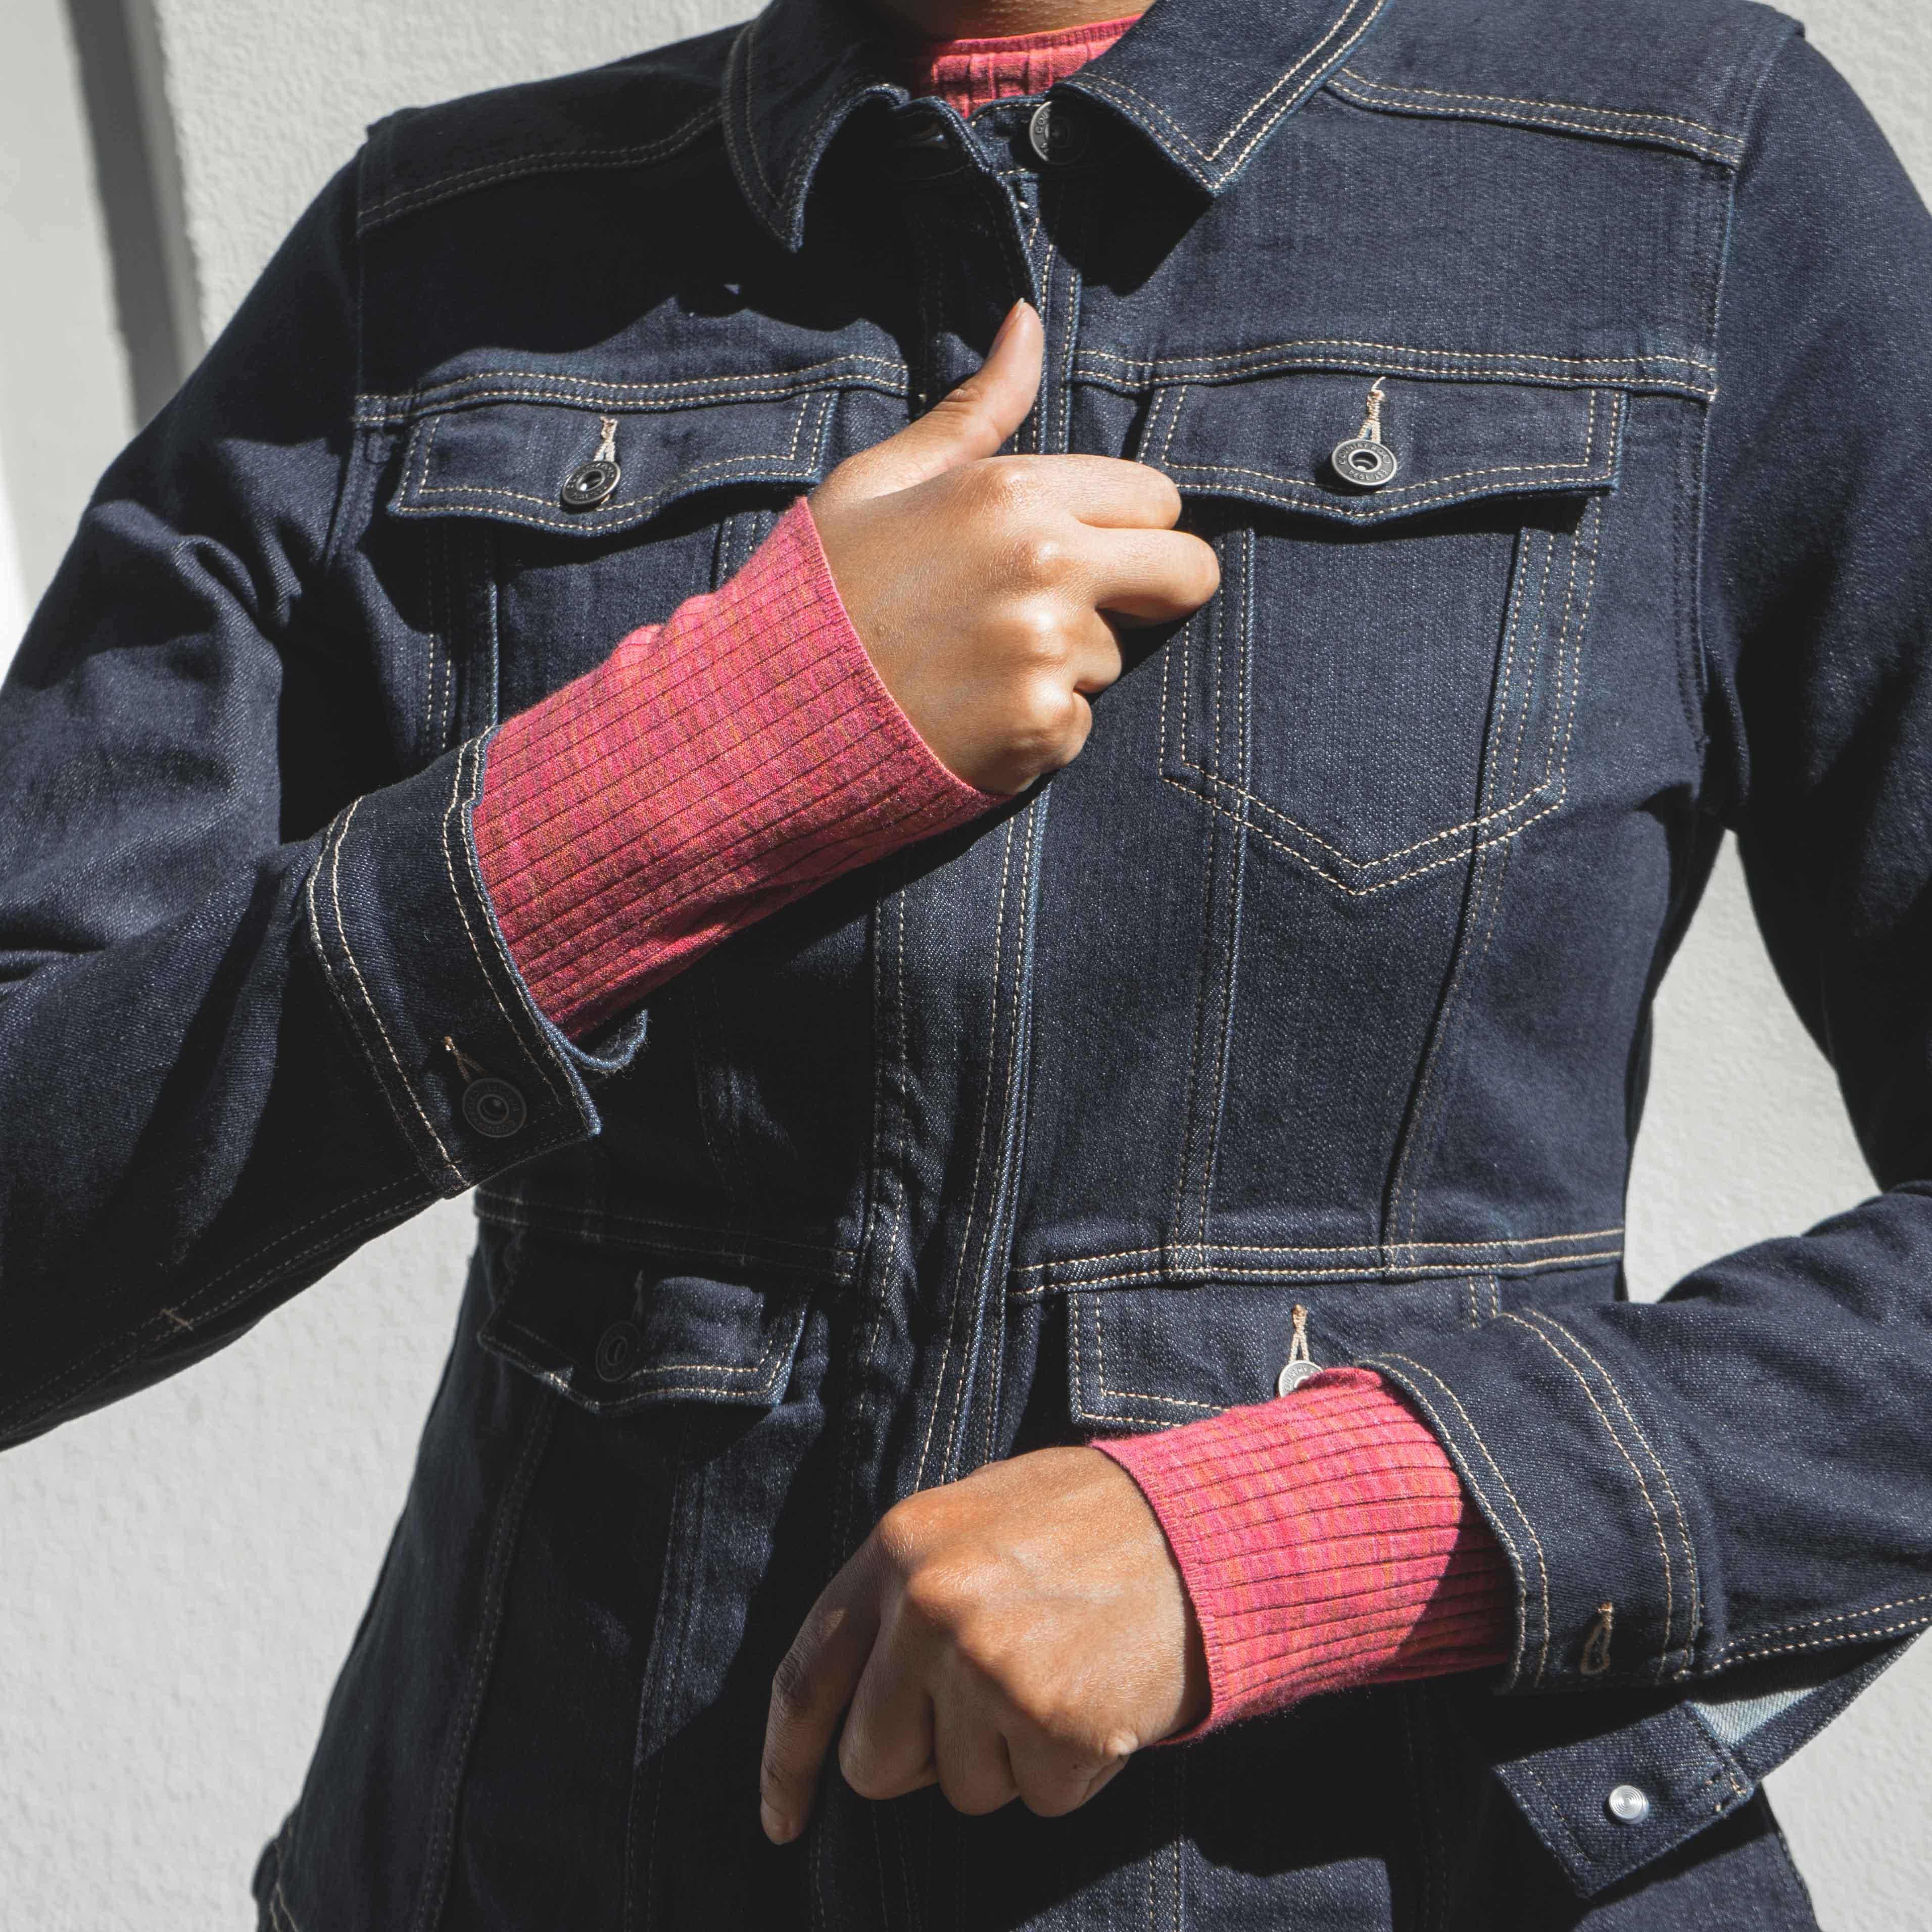 country-road-denim-the-fashion-heist-aicha-4152